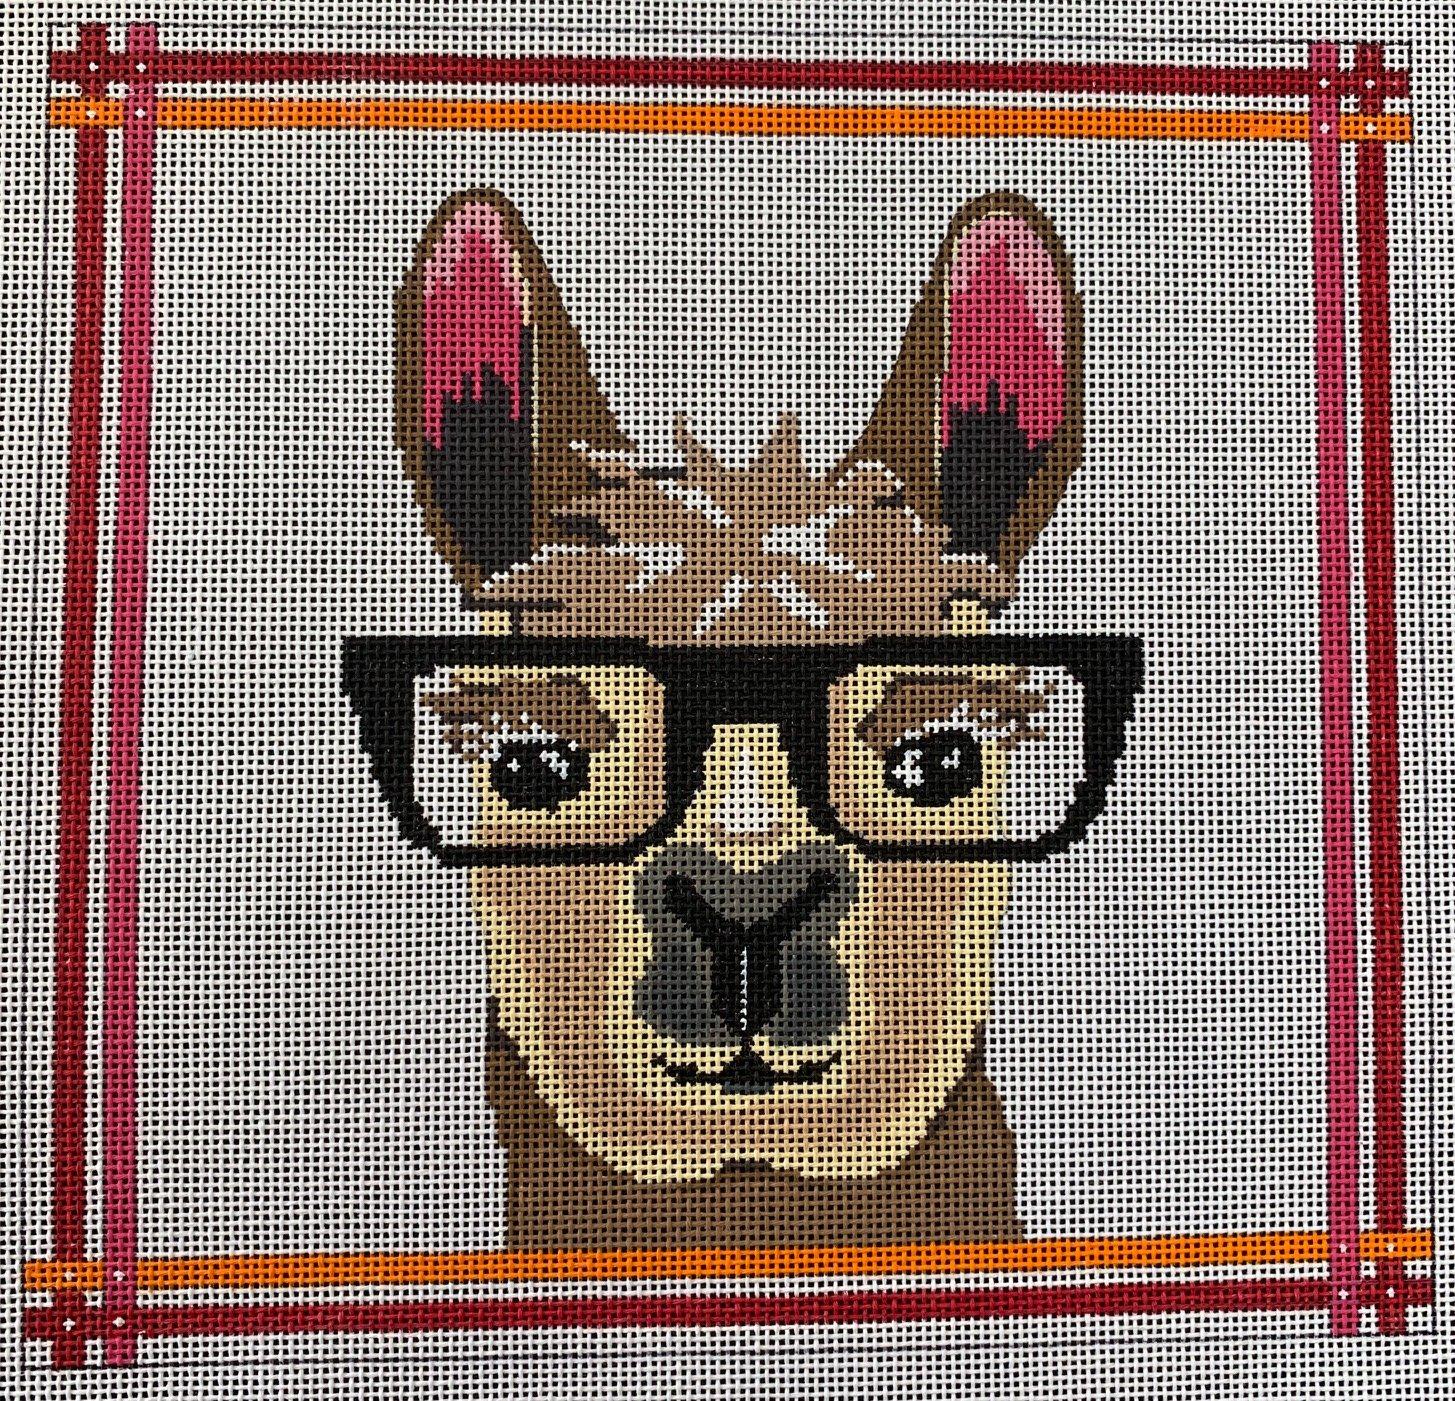 Llama with Glasses